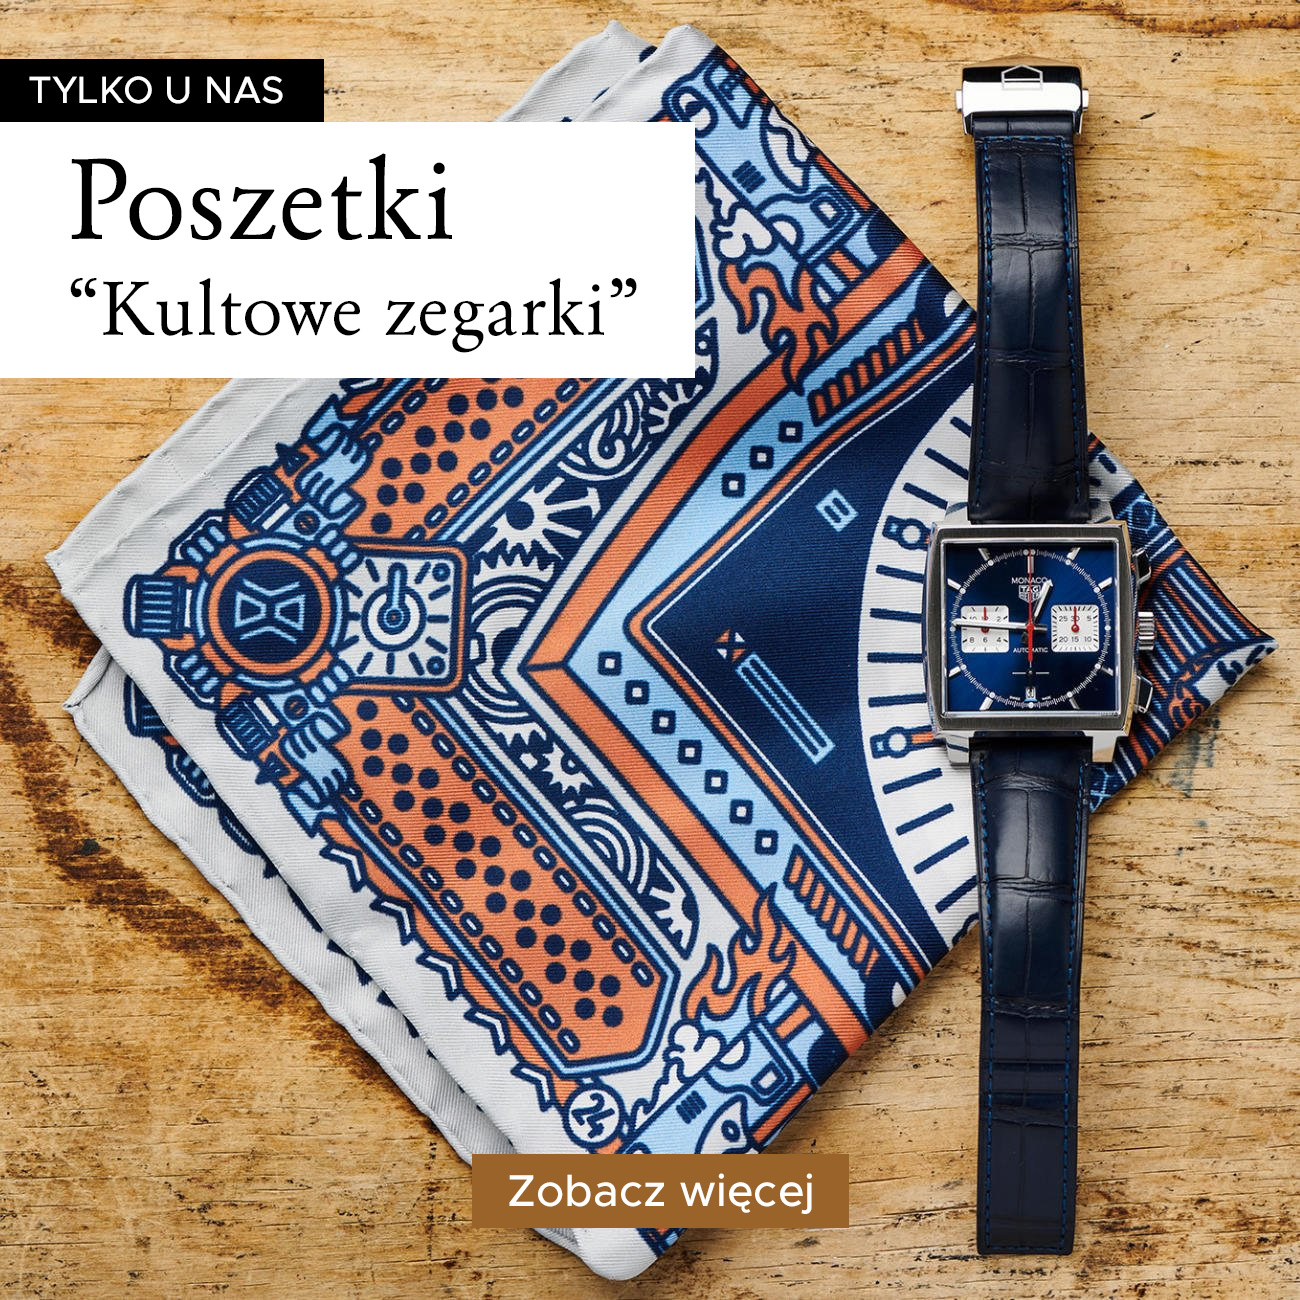 Poszetki 'Kultowe Zegarki'